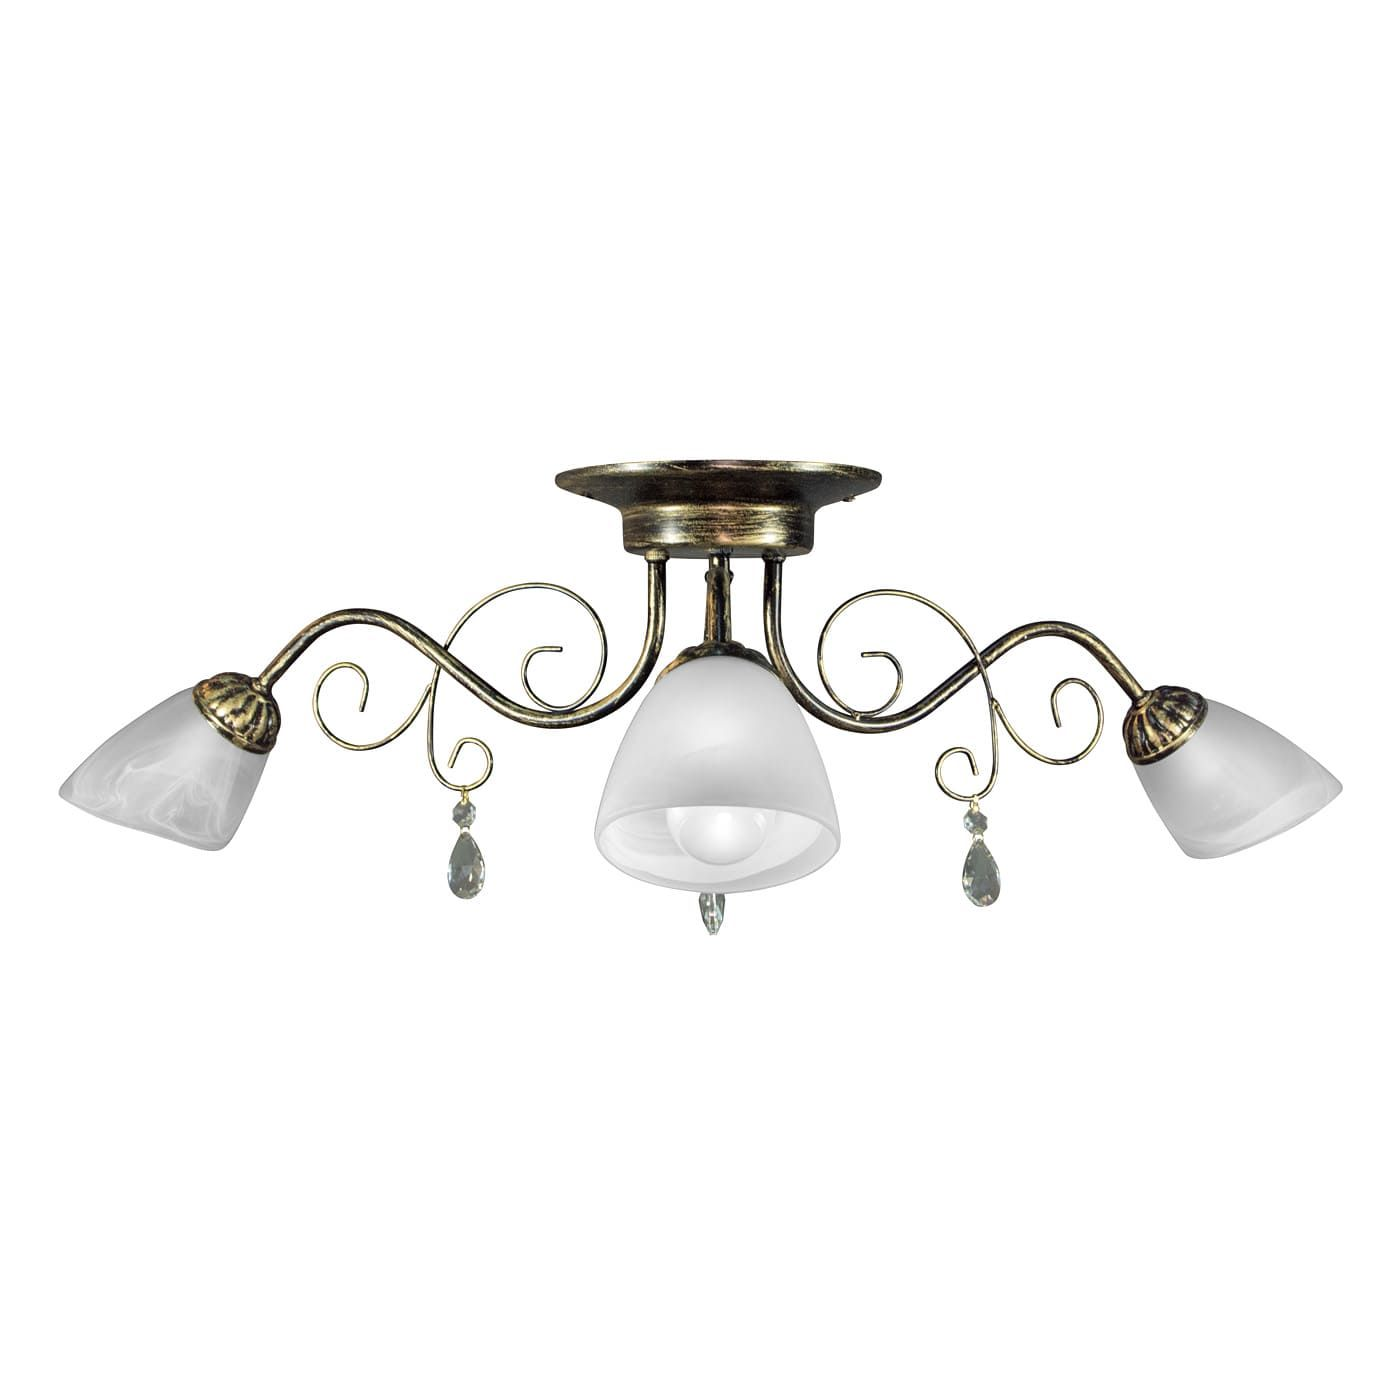 PETRASVET / Ceiling chandelier S2374-3, 3xE14 max. 60W